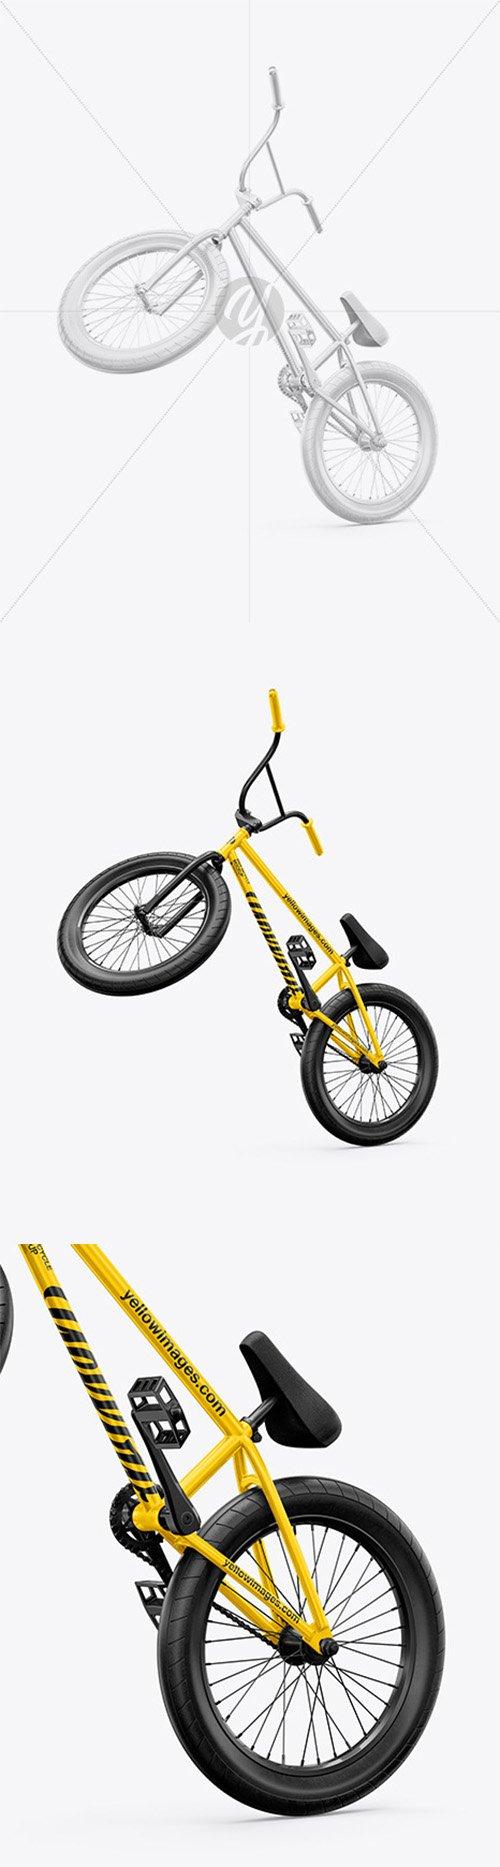 BMX Bicycle Mockup - Half Side View 65208